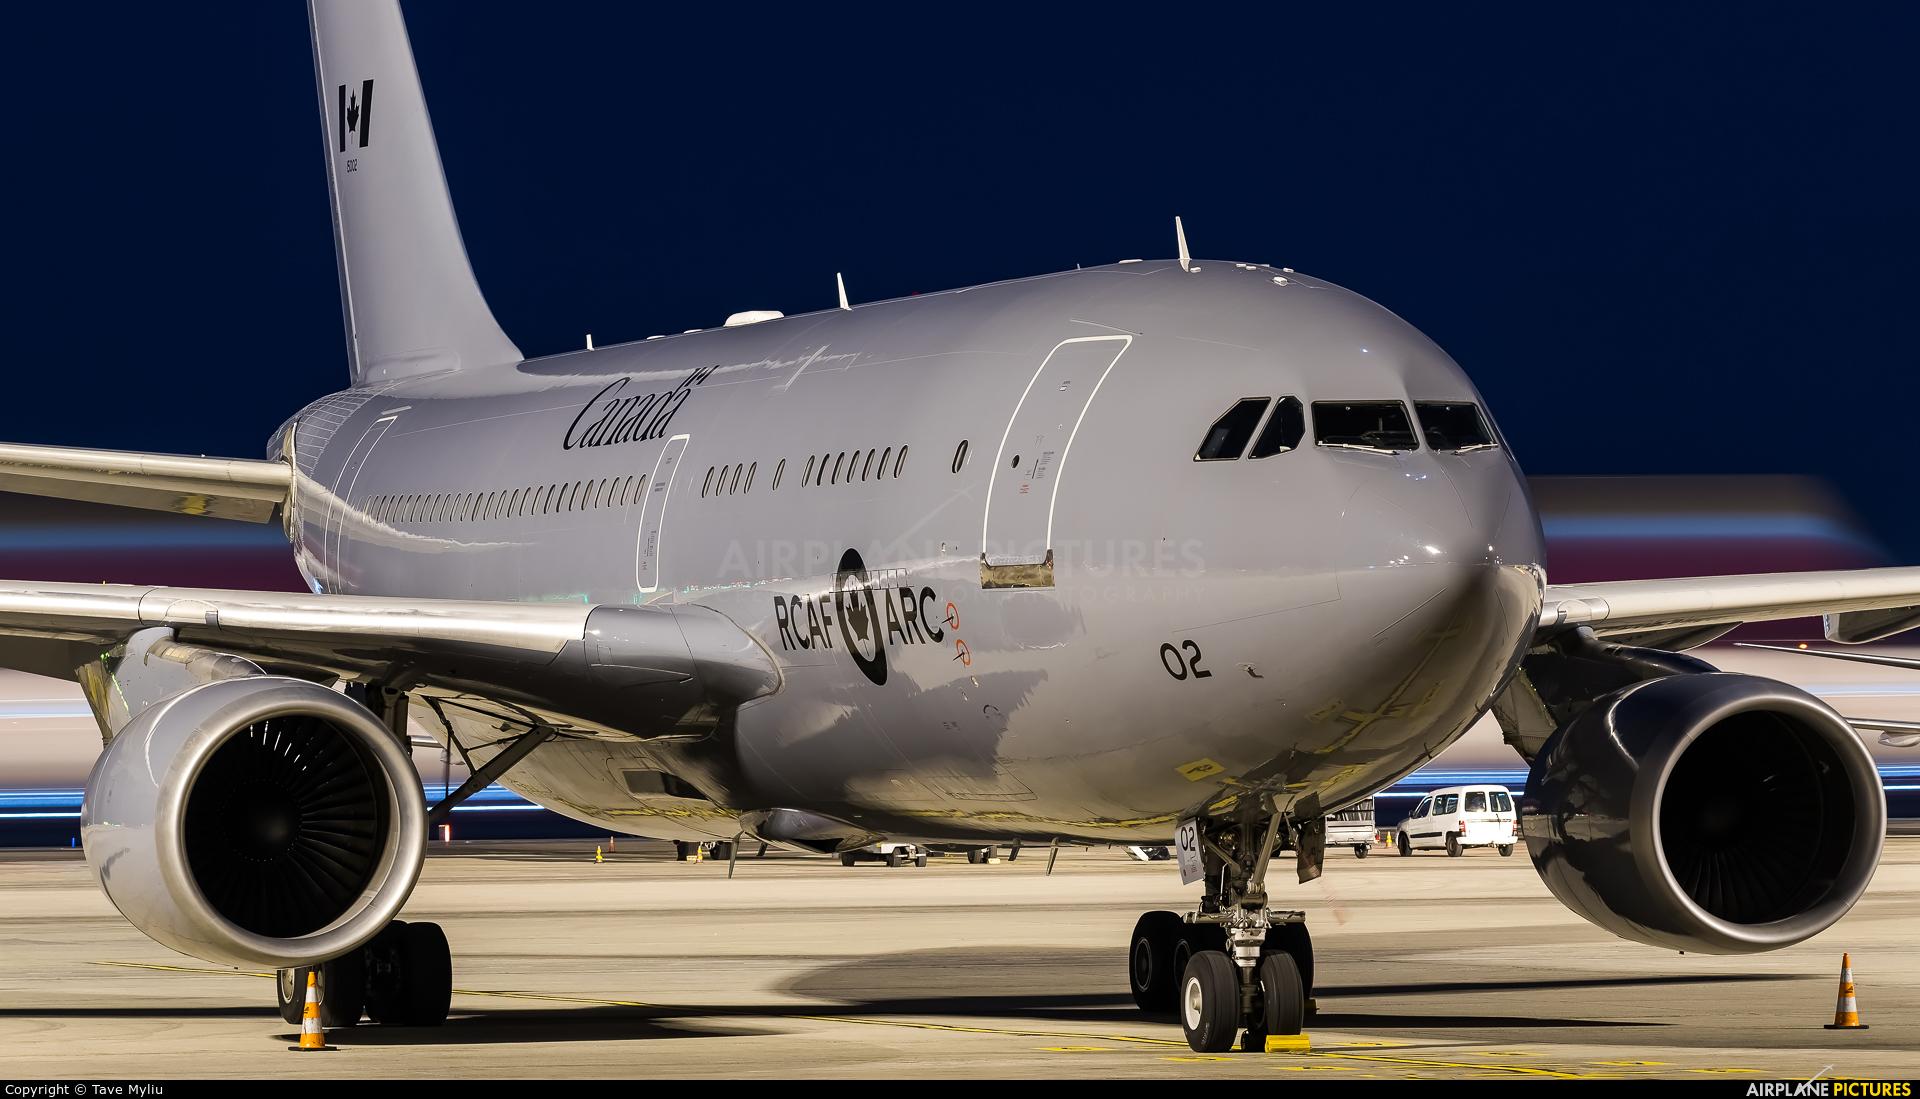 Canada - Air Force 15002 aircraft at Tenerife Sur - Reina Sofia